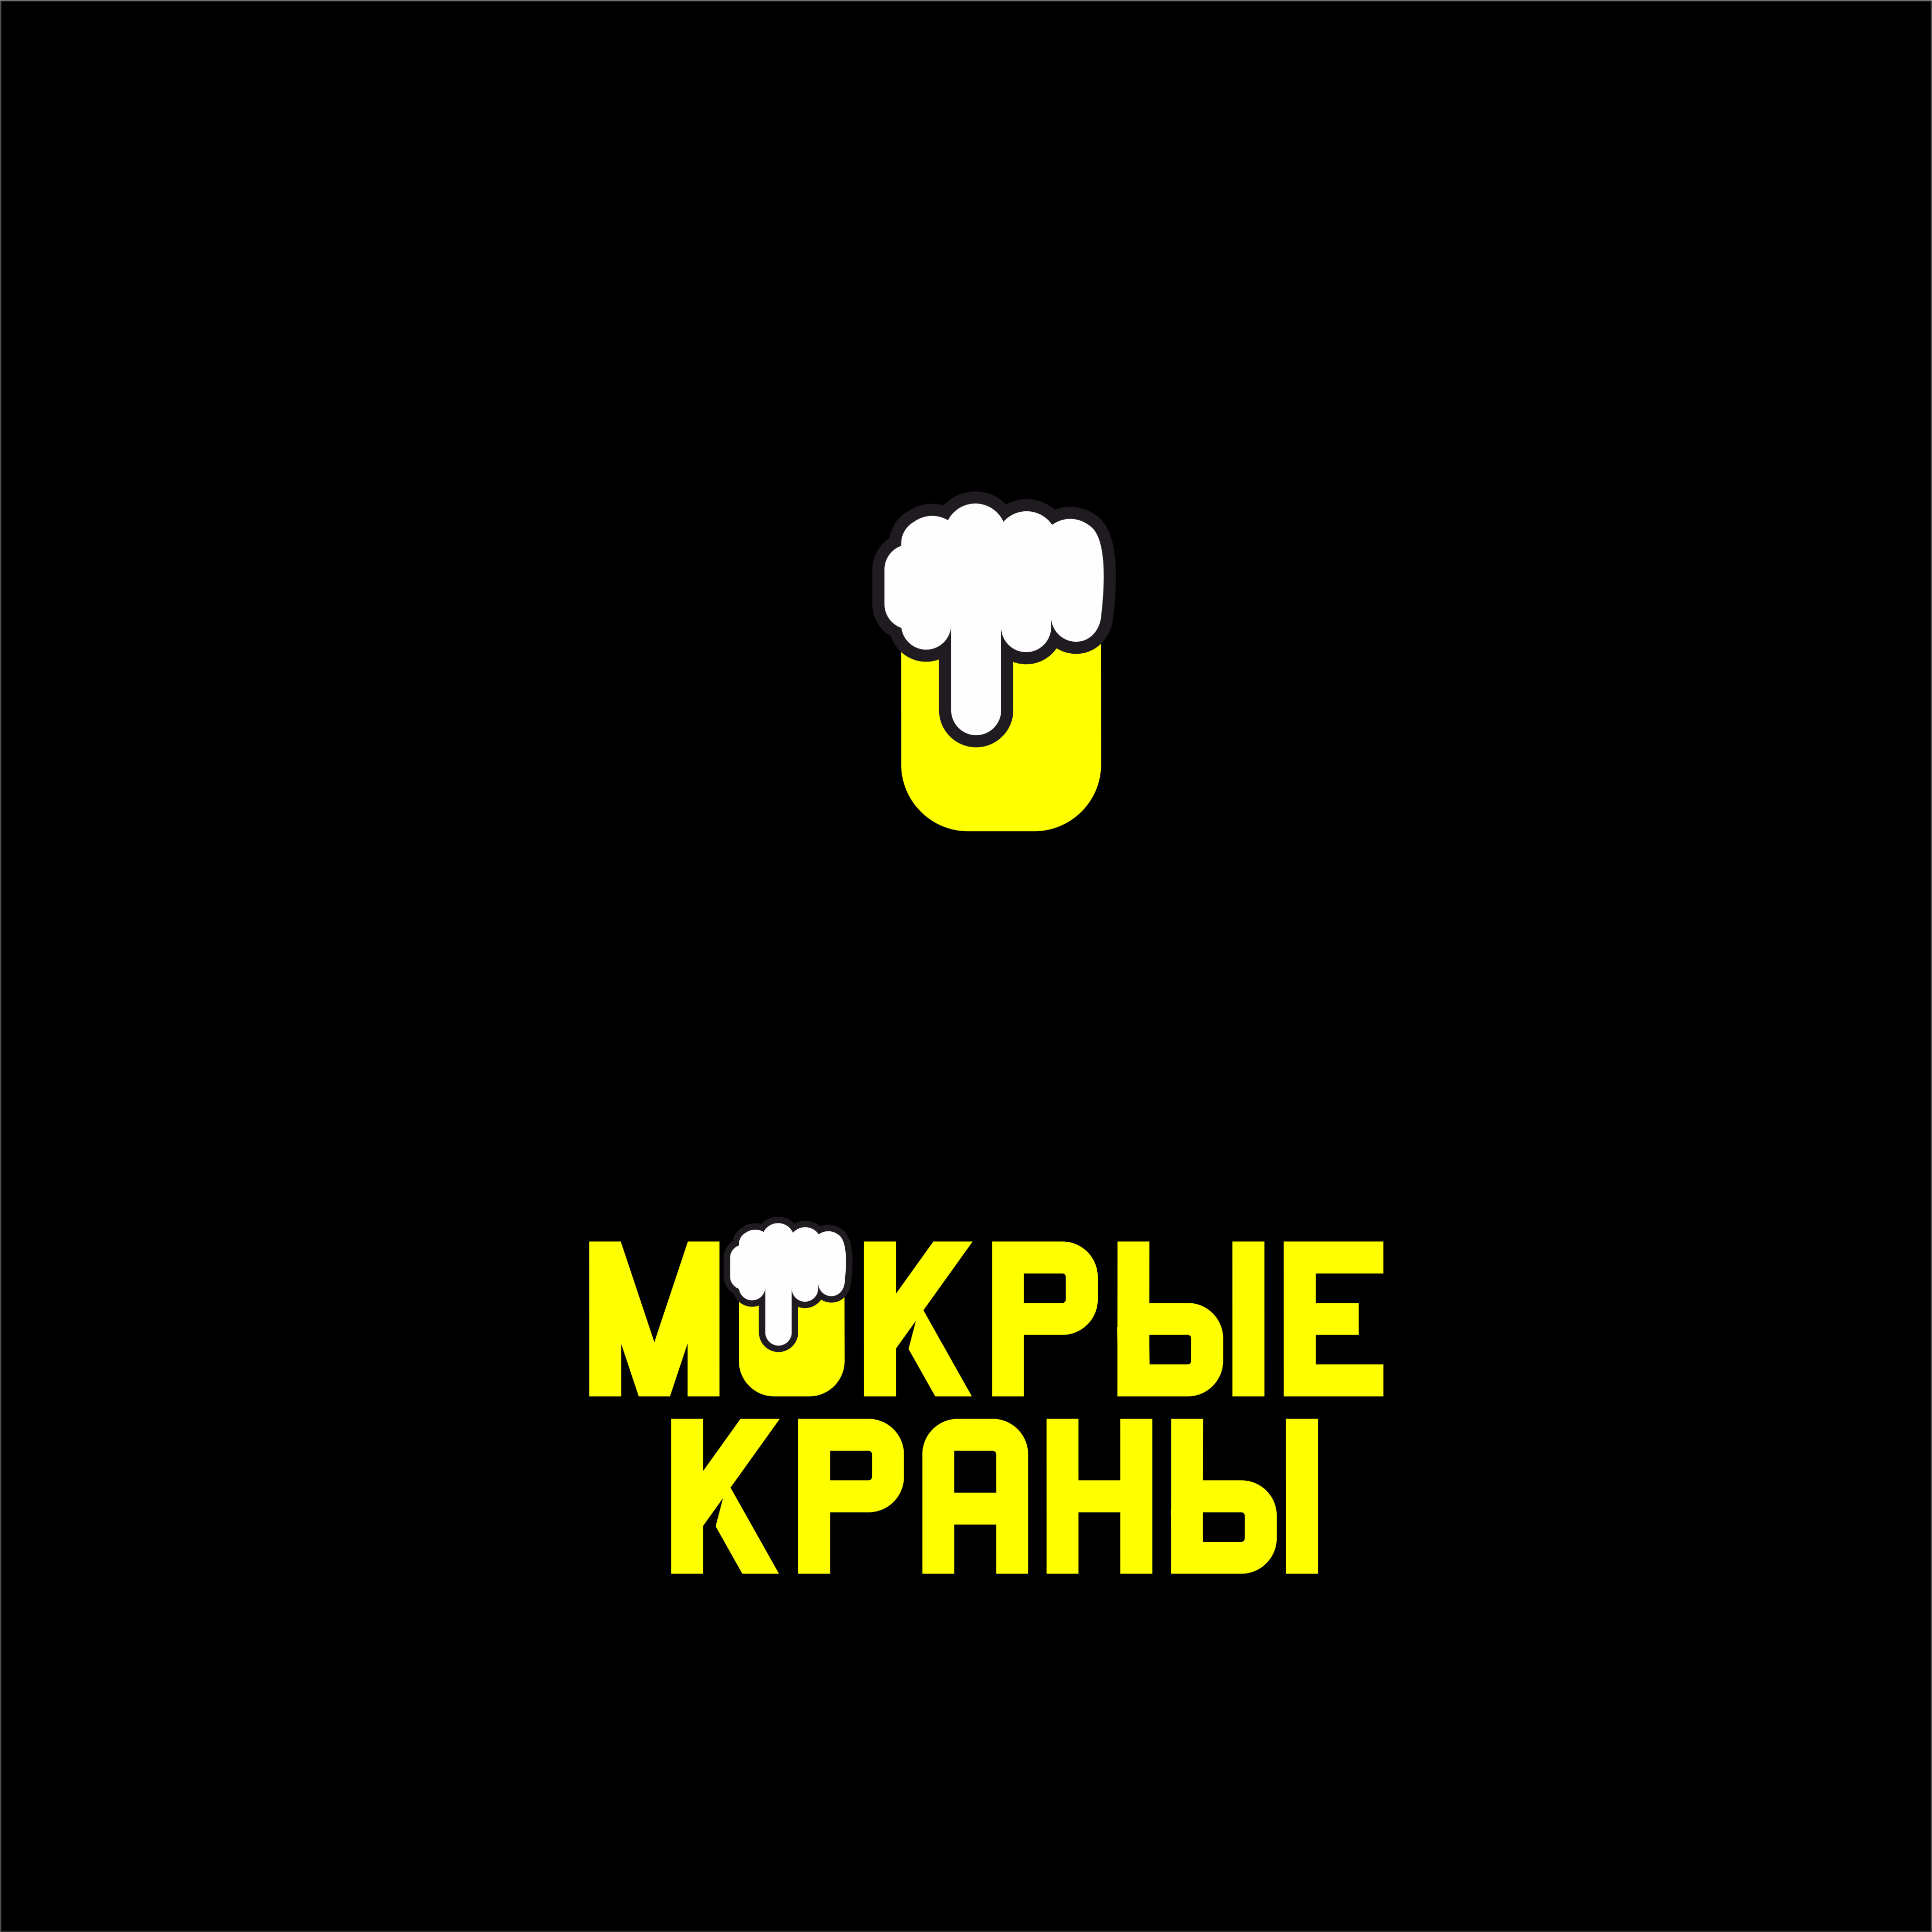 Вывеска/логотип для пивного магазина фото f_2316020f1063927e.png